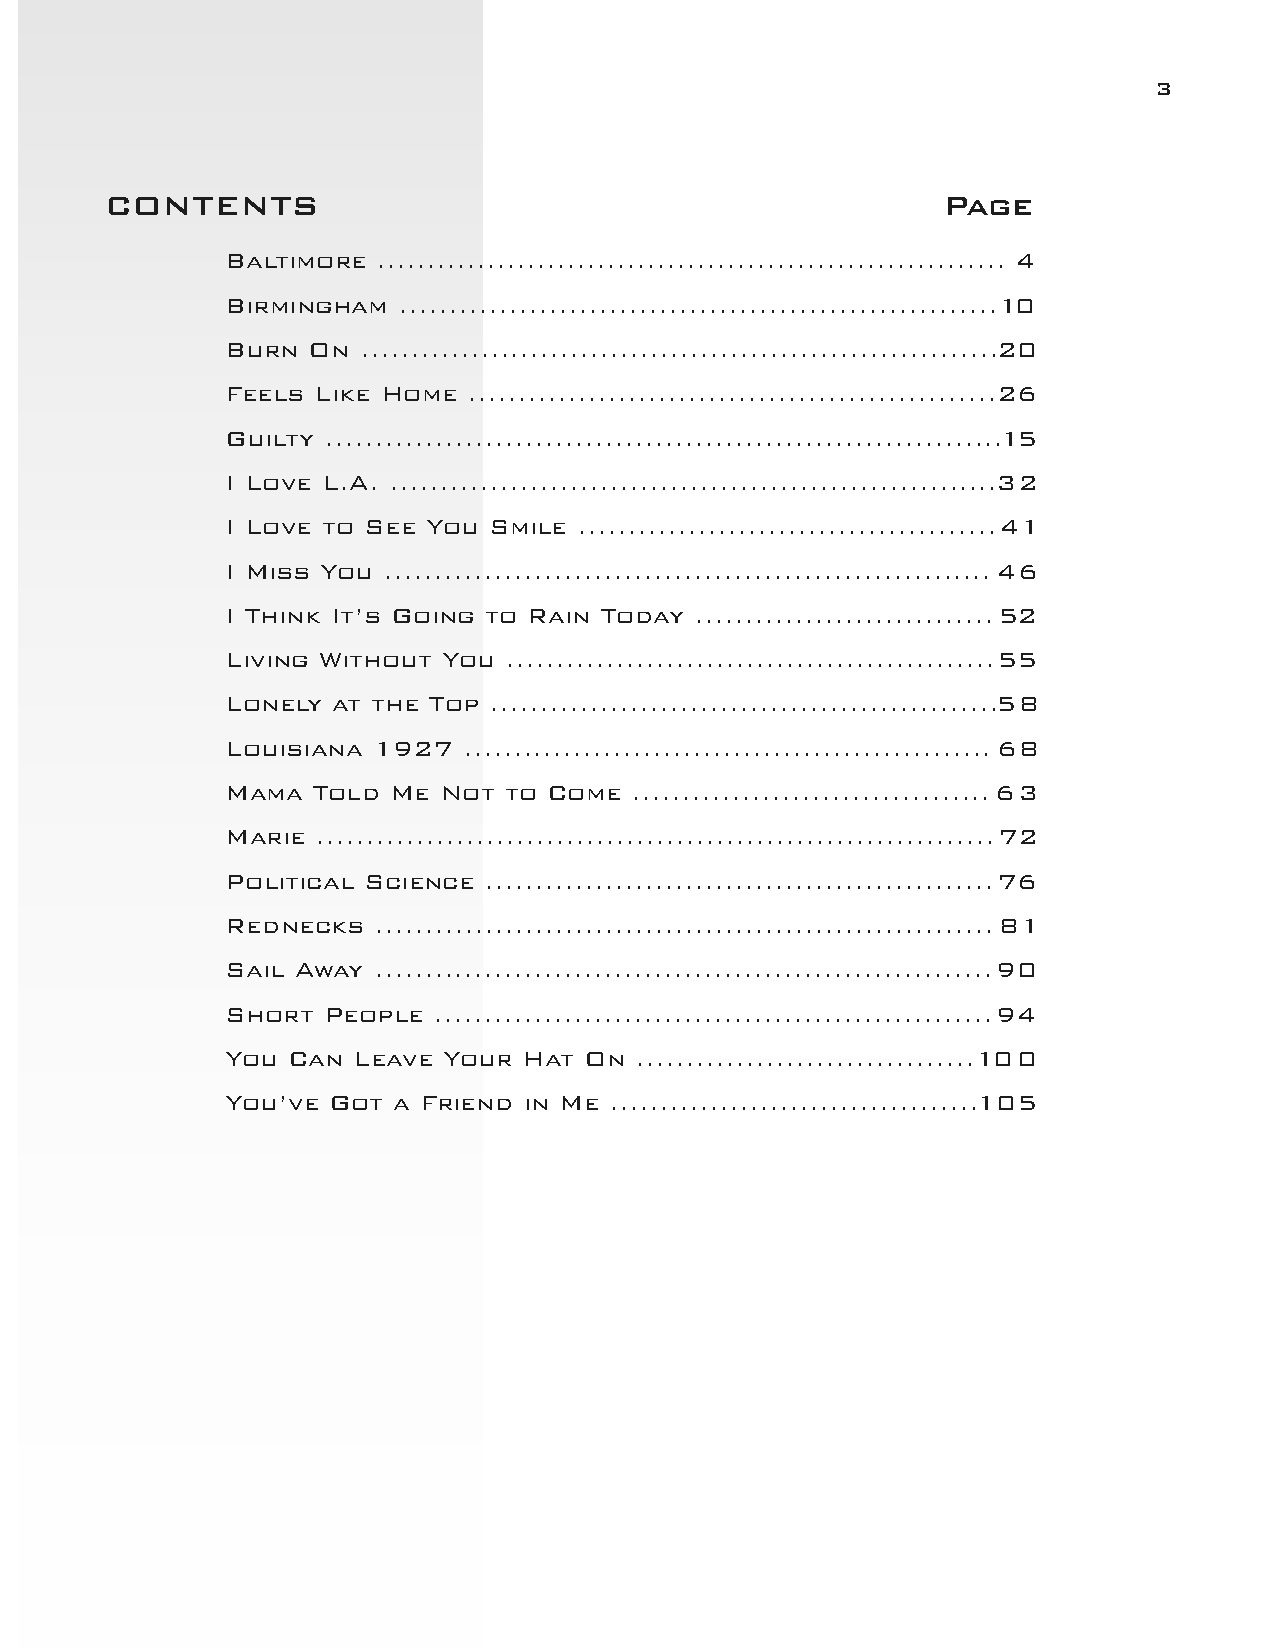 The Randy Newman Guitar Songbook By Randy Newman Jw Pepper Sheet